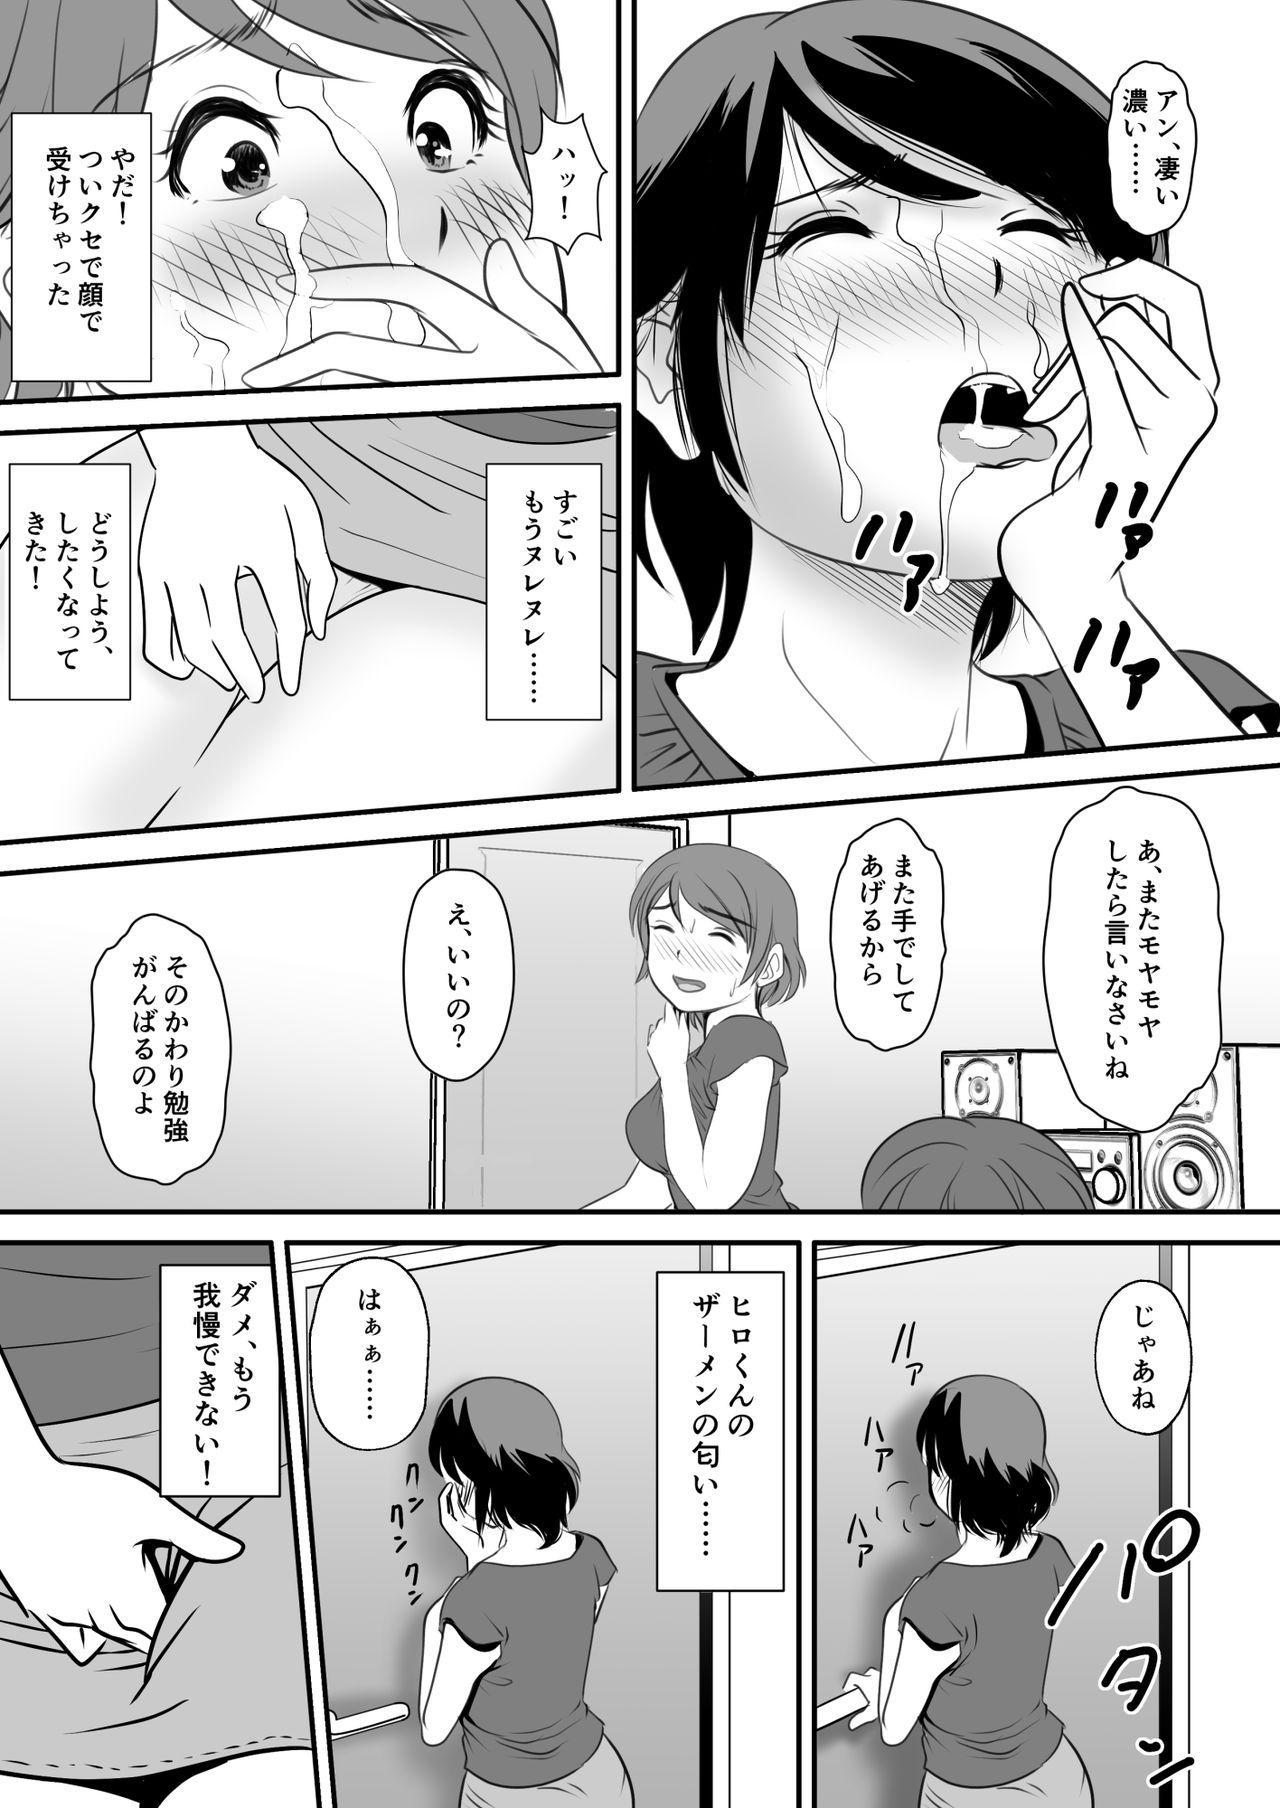 [Milky Club] Netori Appli -Kuso Oyaji kara Kaa-san o Netotta ken- 17